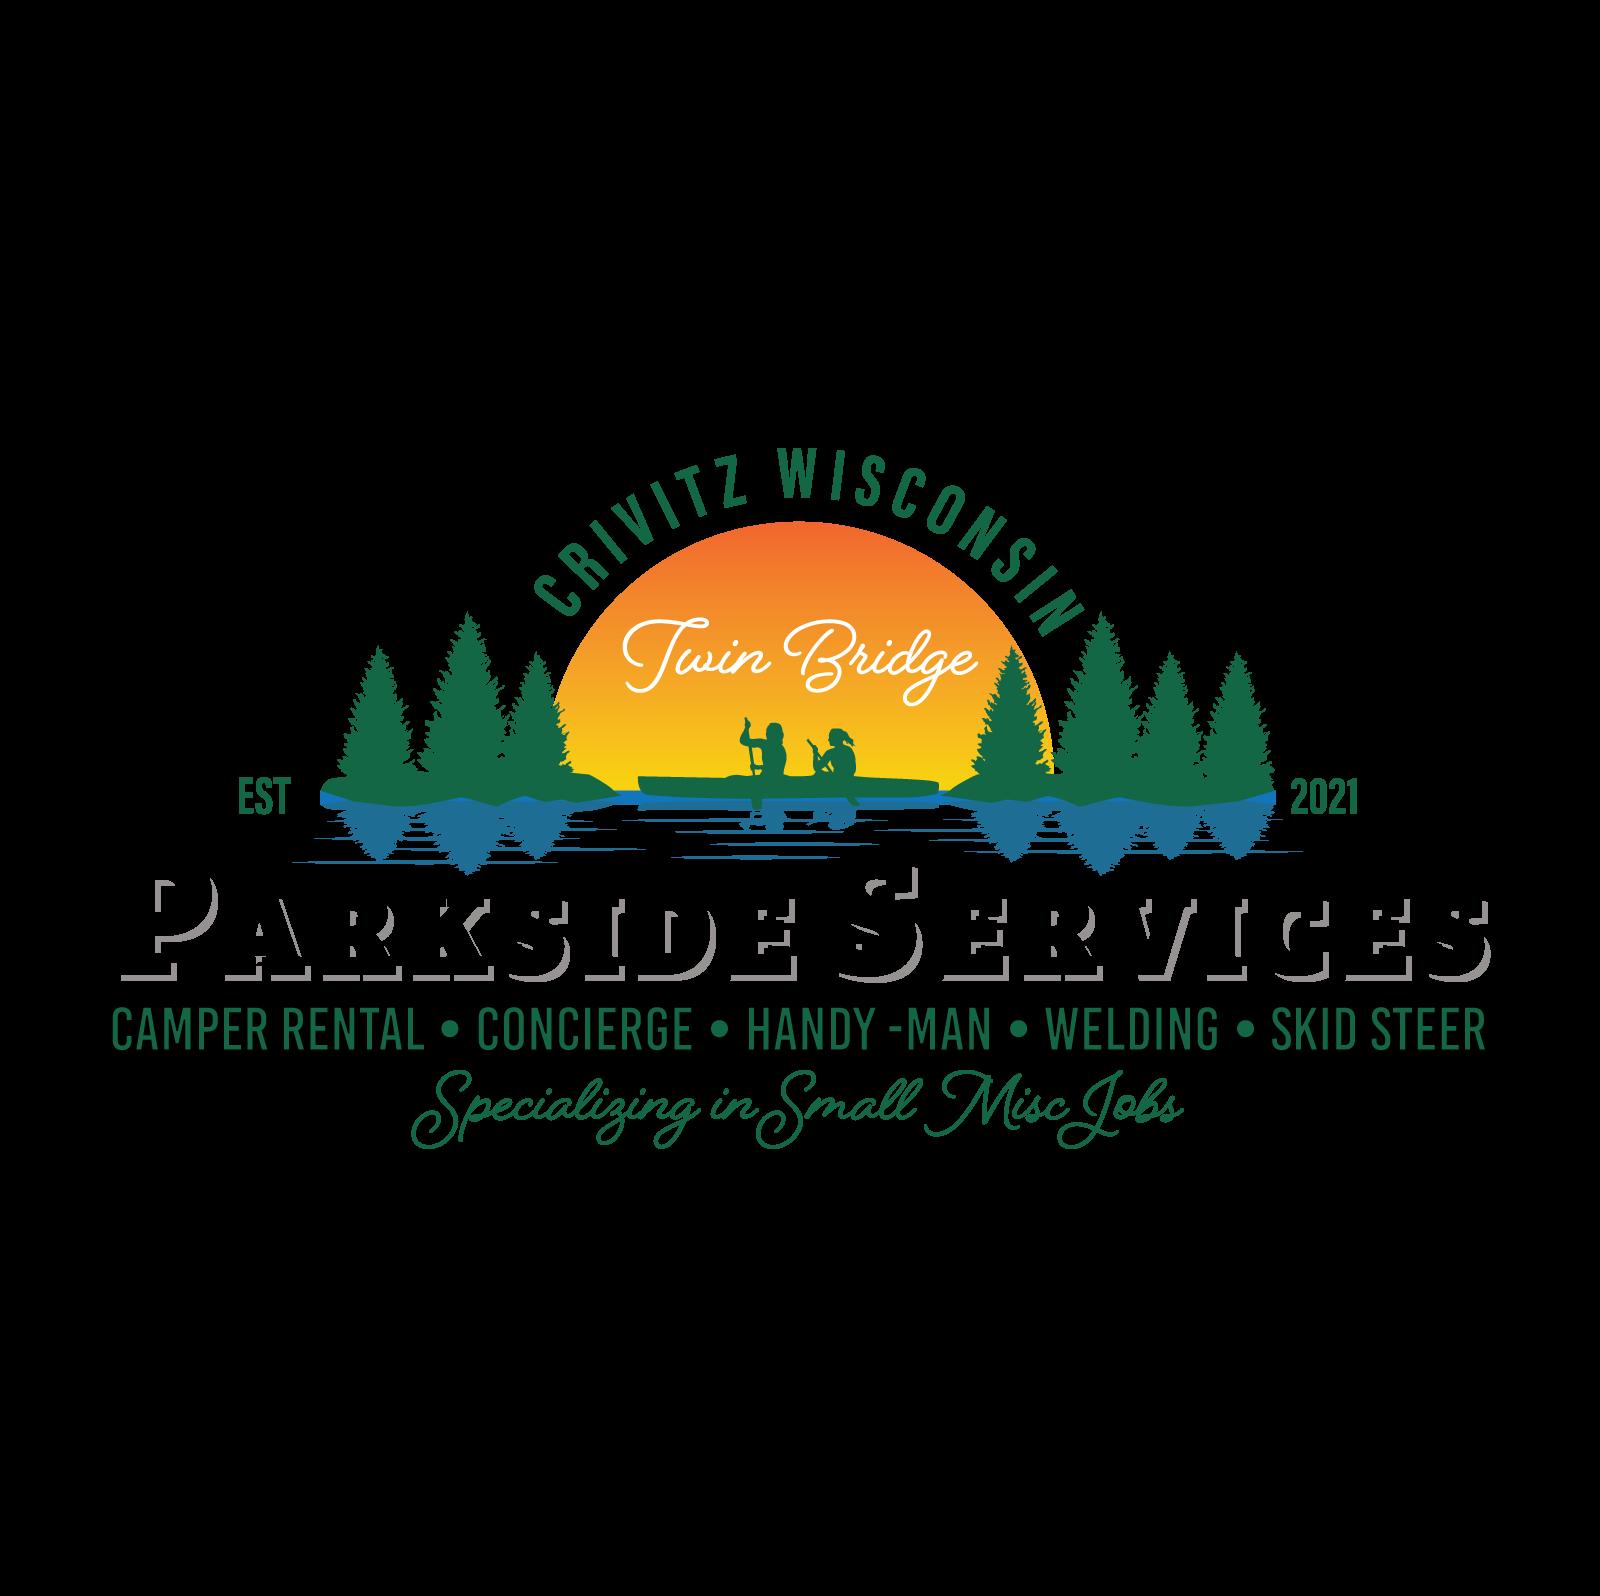 Parkside Services